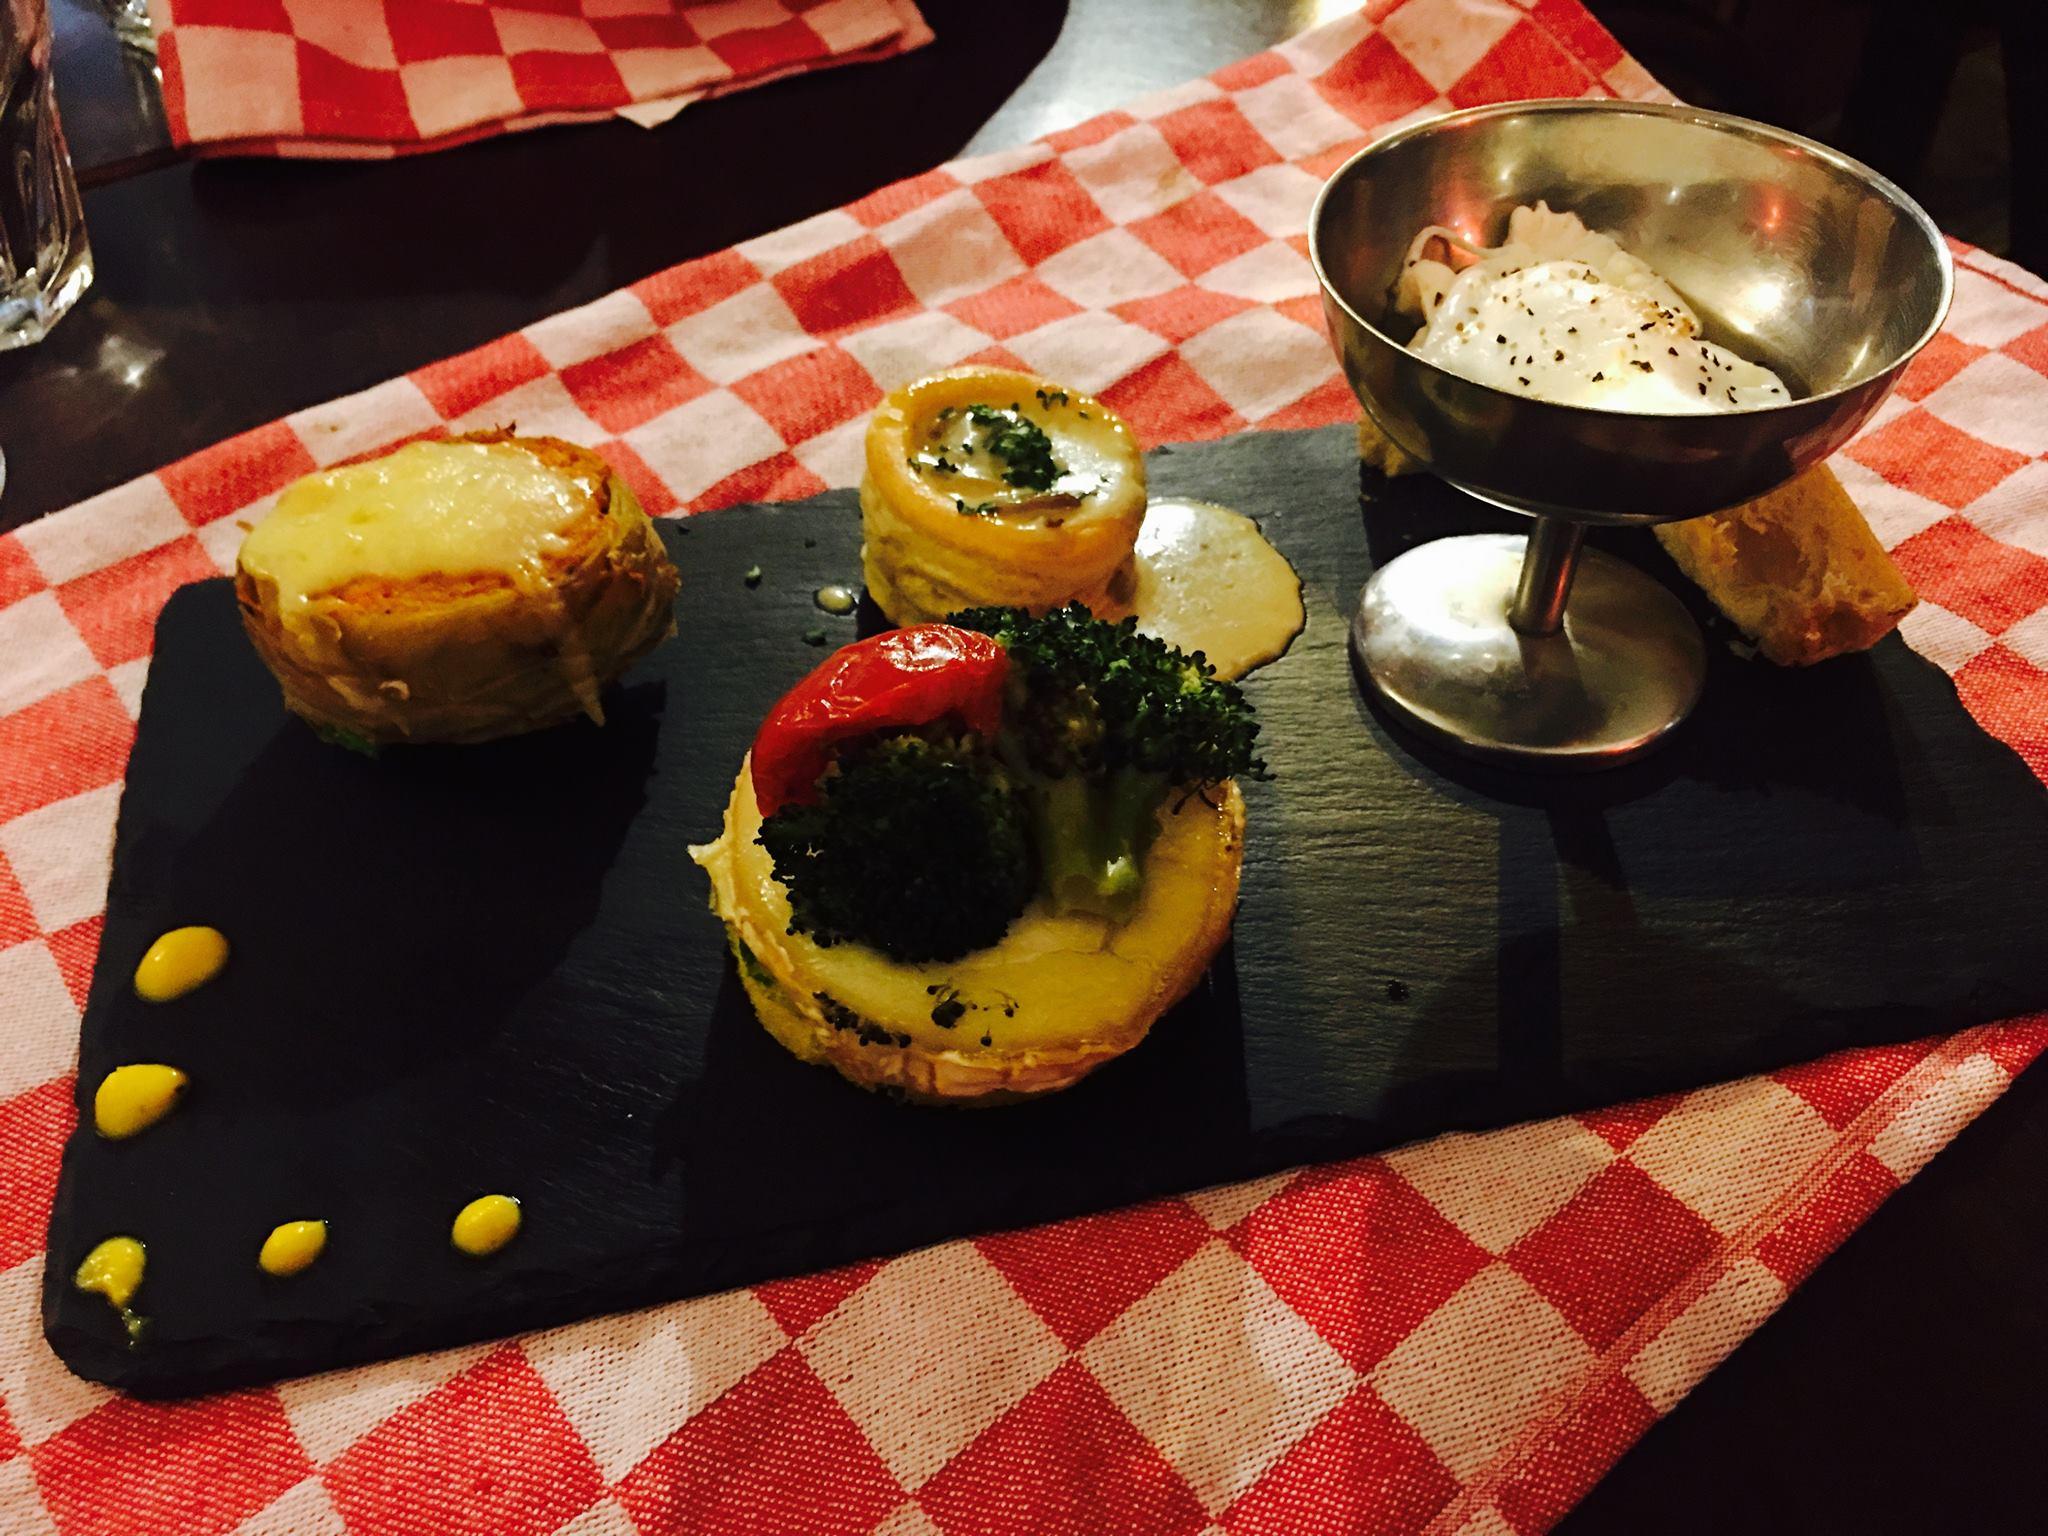 Vegetarian quatuor on a slate